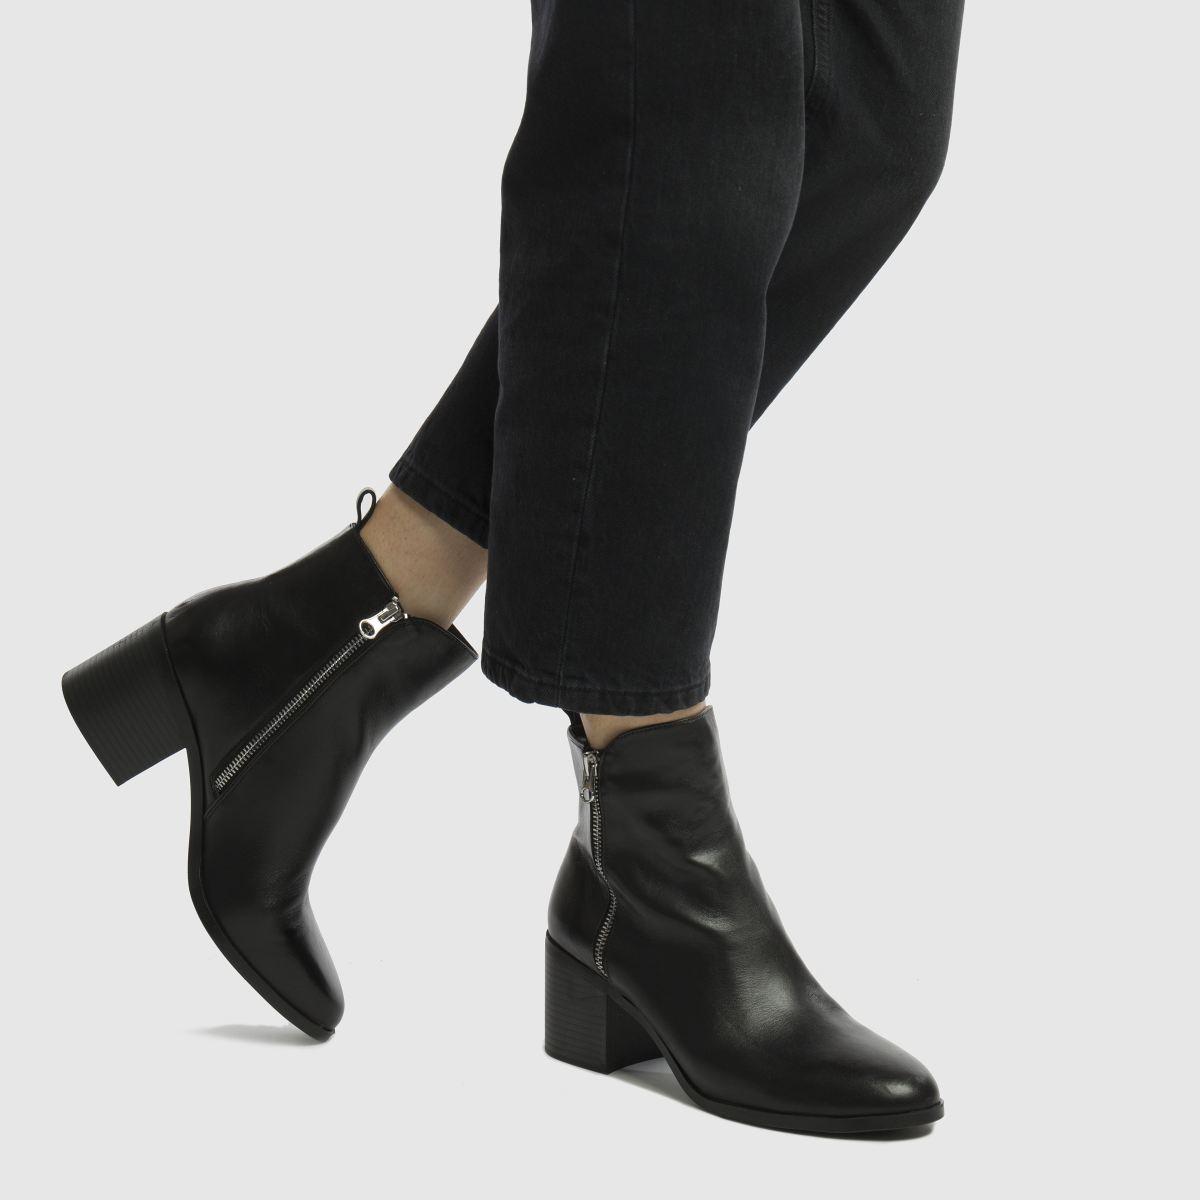 Damen Schwarz schuh Gute Trespass Boots | schuh Gute schuh Qualität beliebte Schuhe 721c63